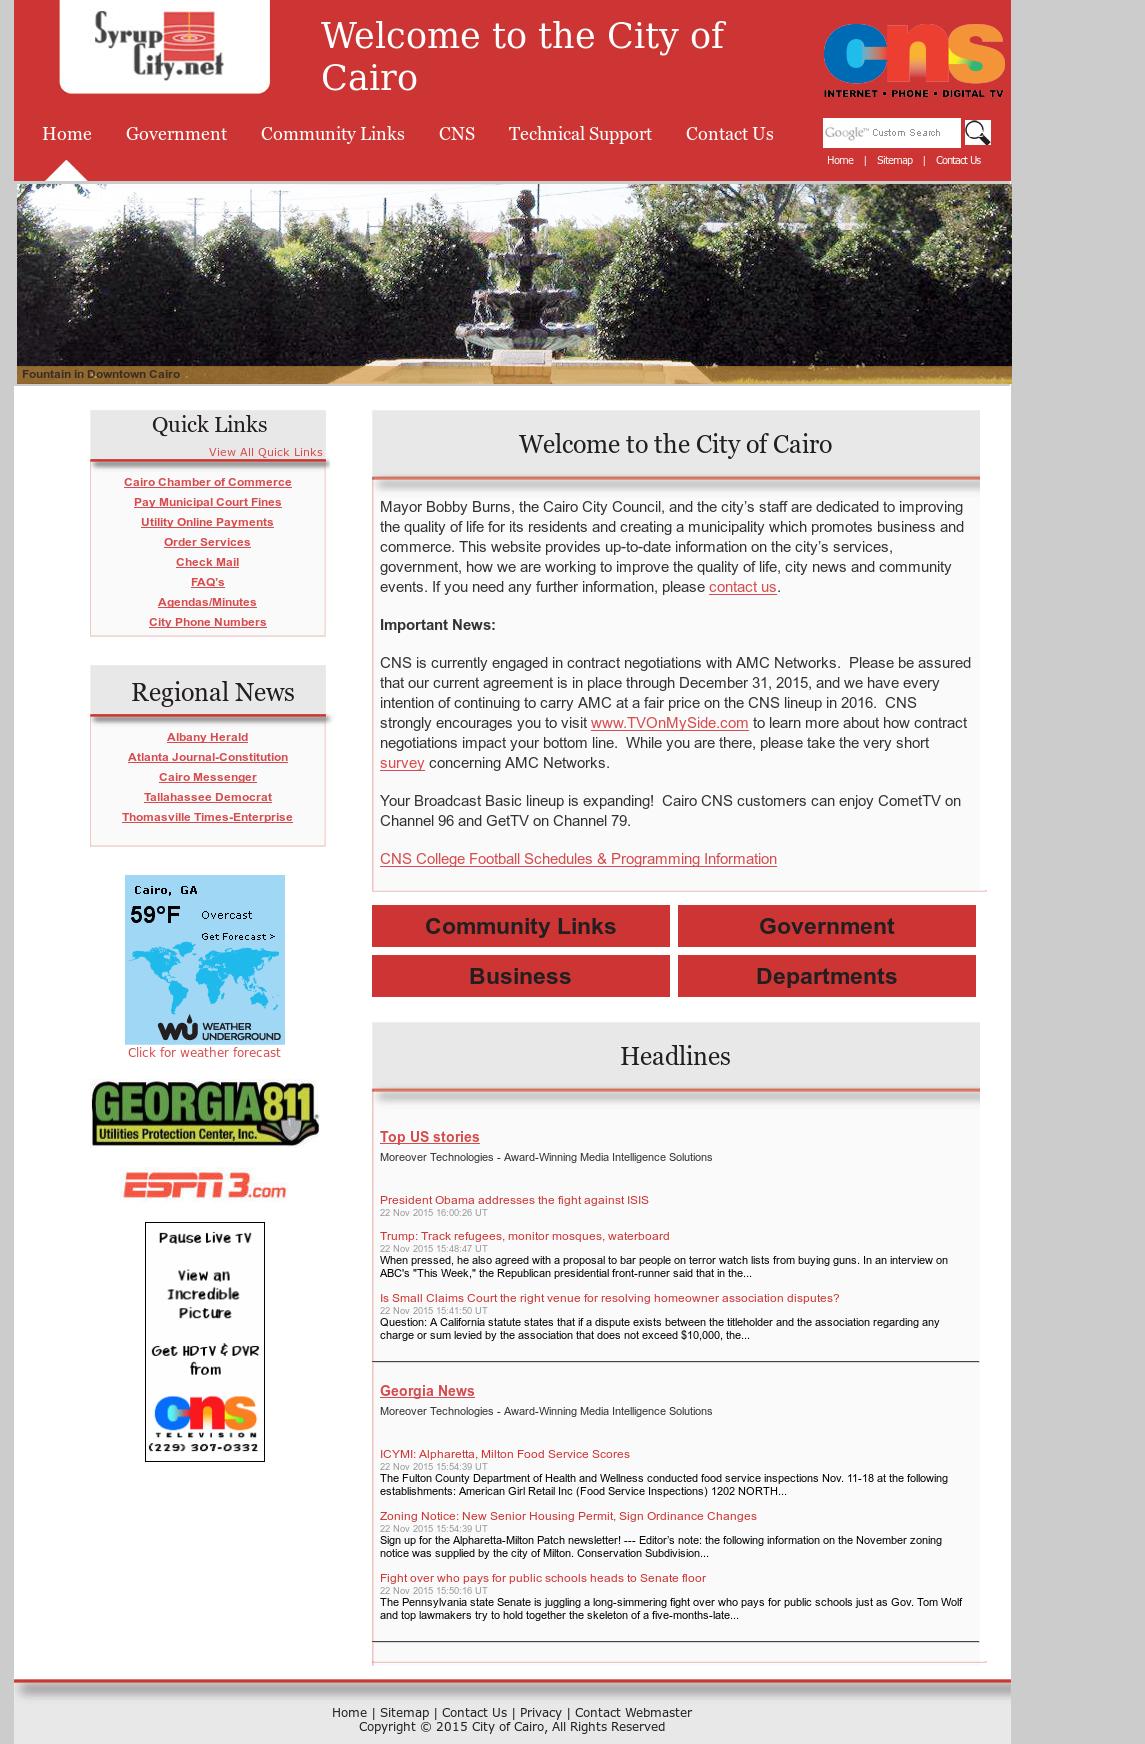 Community Network Services (CNS) Competitors, Revenue and